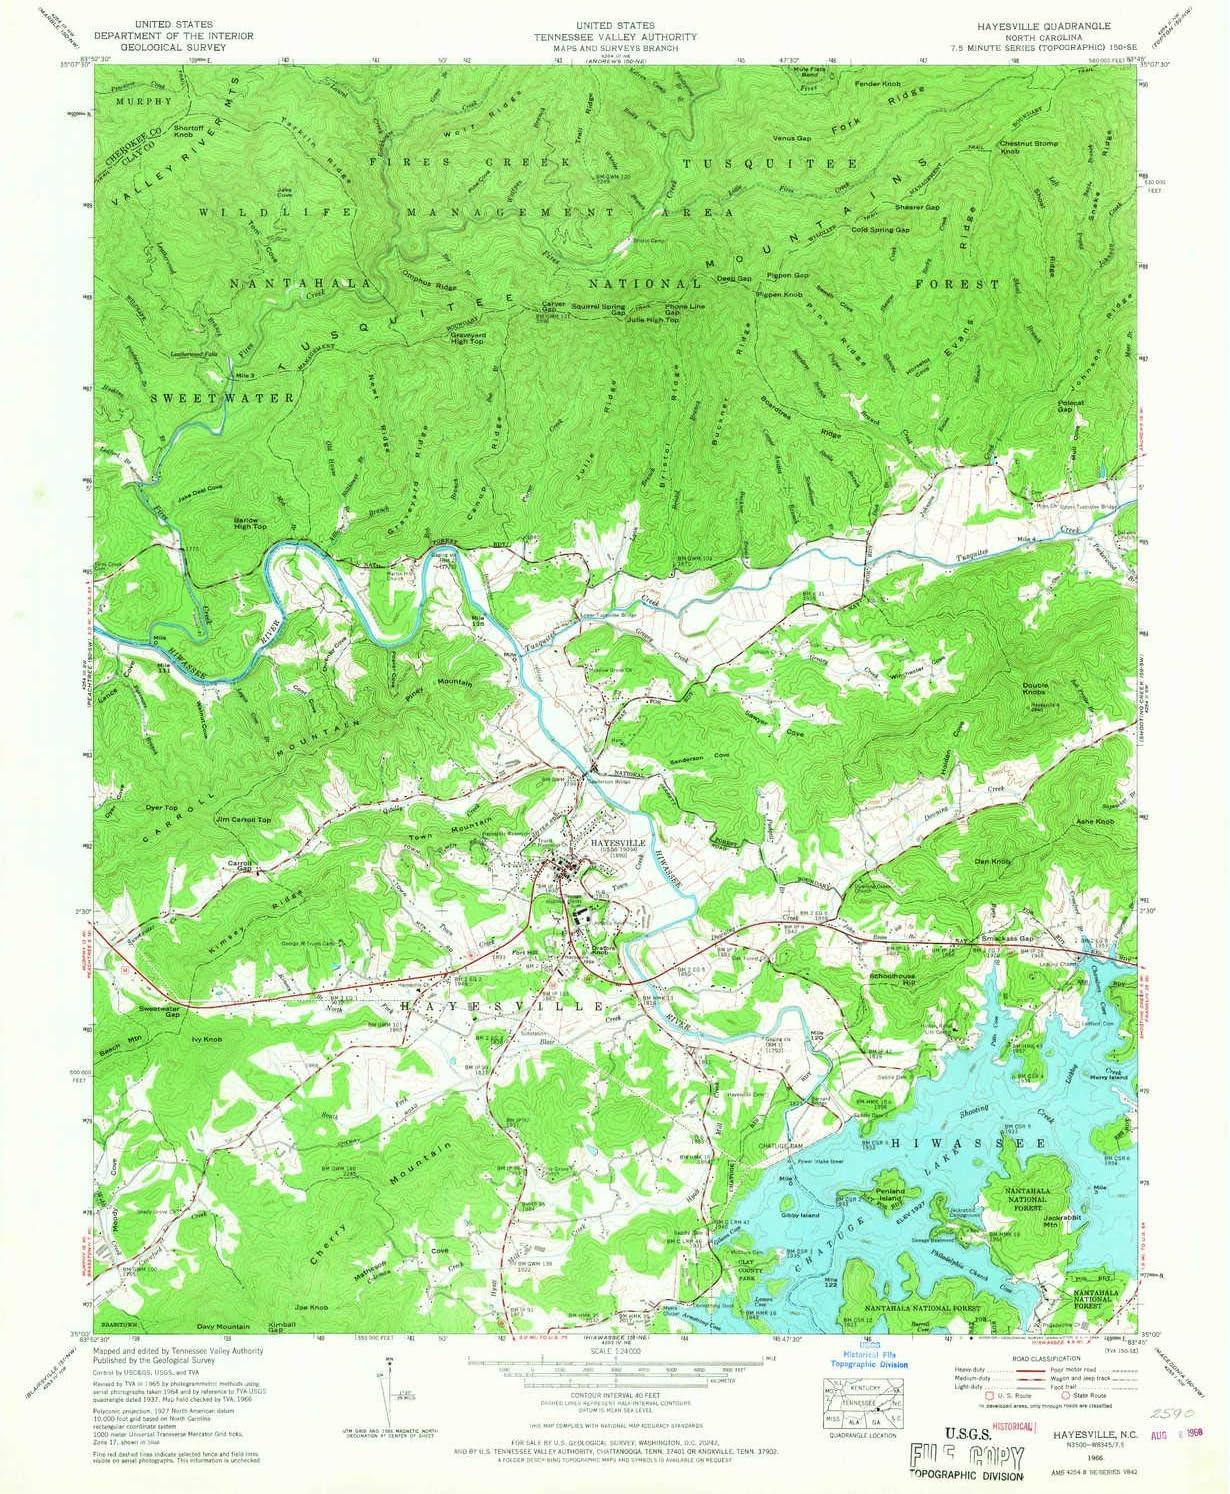 YellowMaps Hayesville NC topo map Atlanta Mall 1:24000 Scale X Minu 7.5 Max 47% OFF